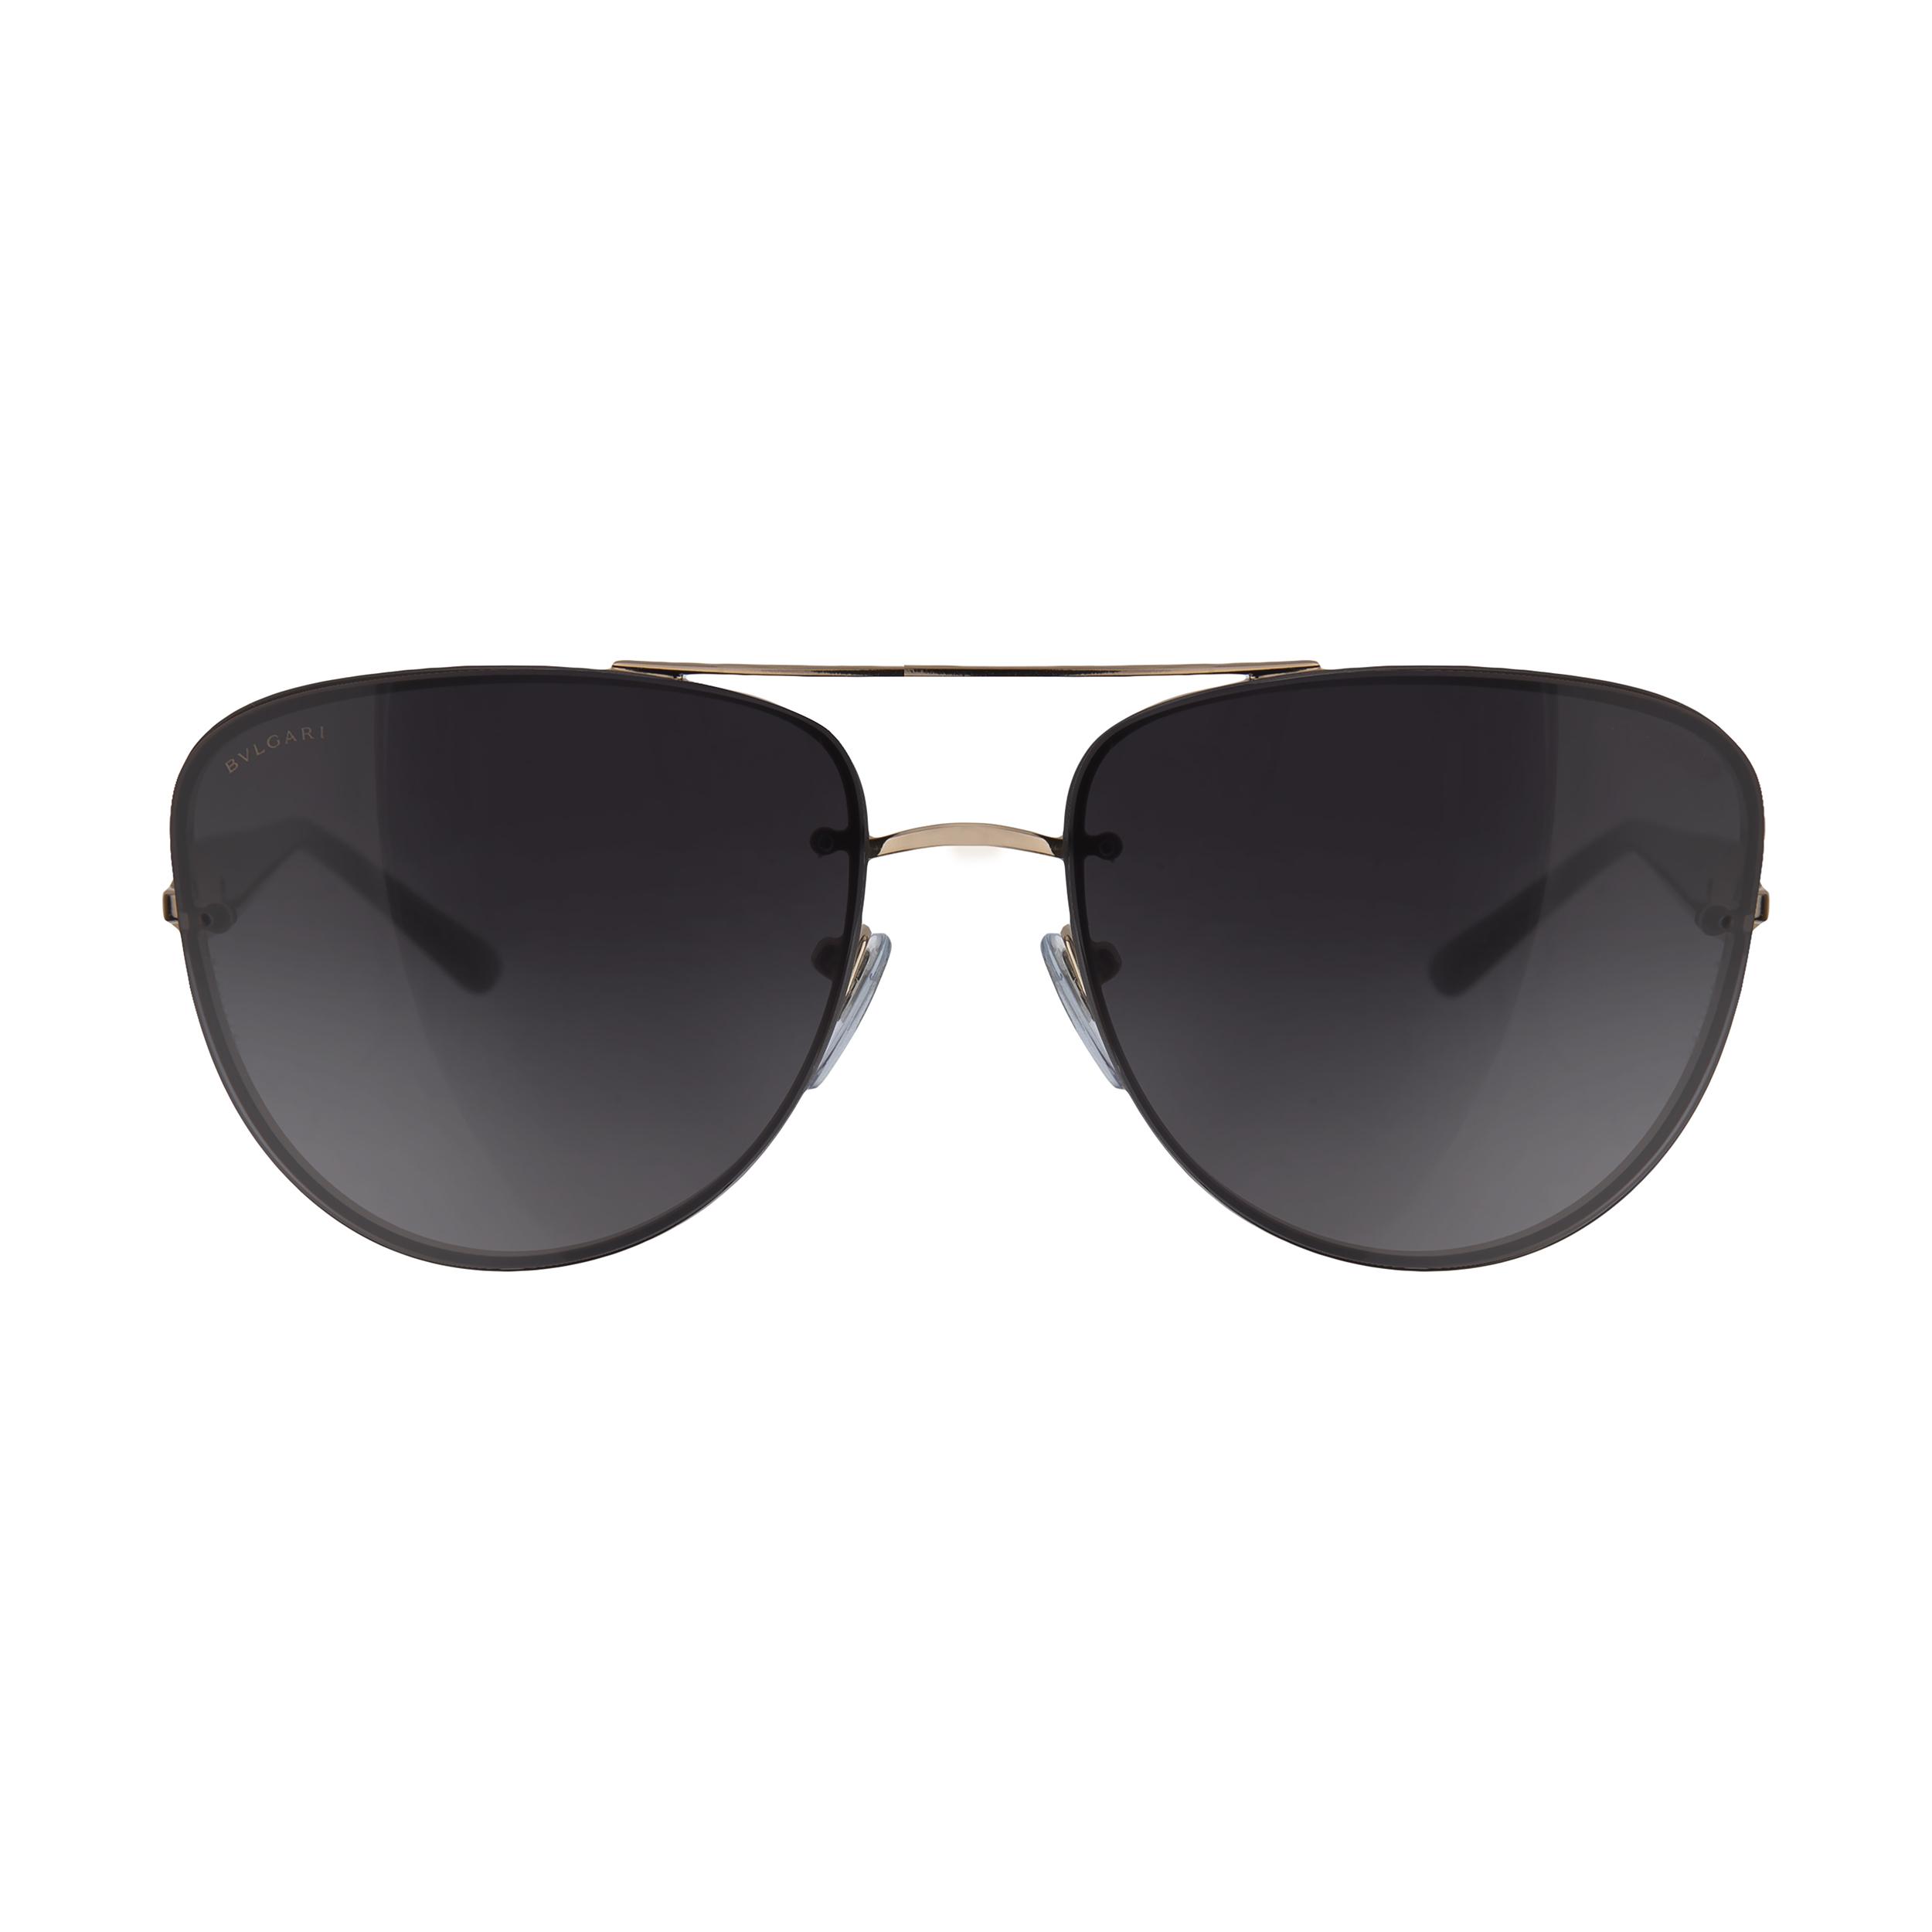 عینک آفتابی مردانه بولگاری مدل BV6086B 20148G -  - 2